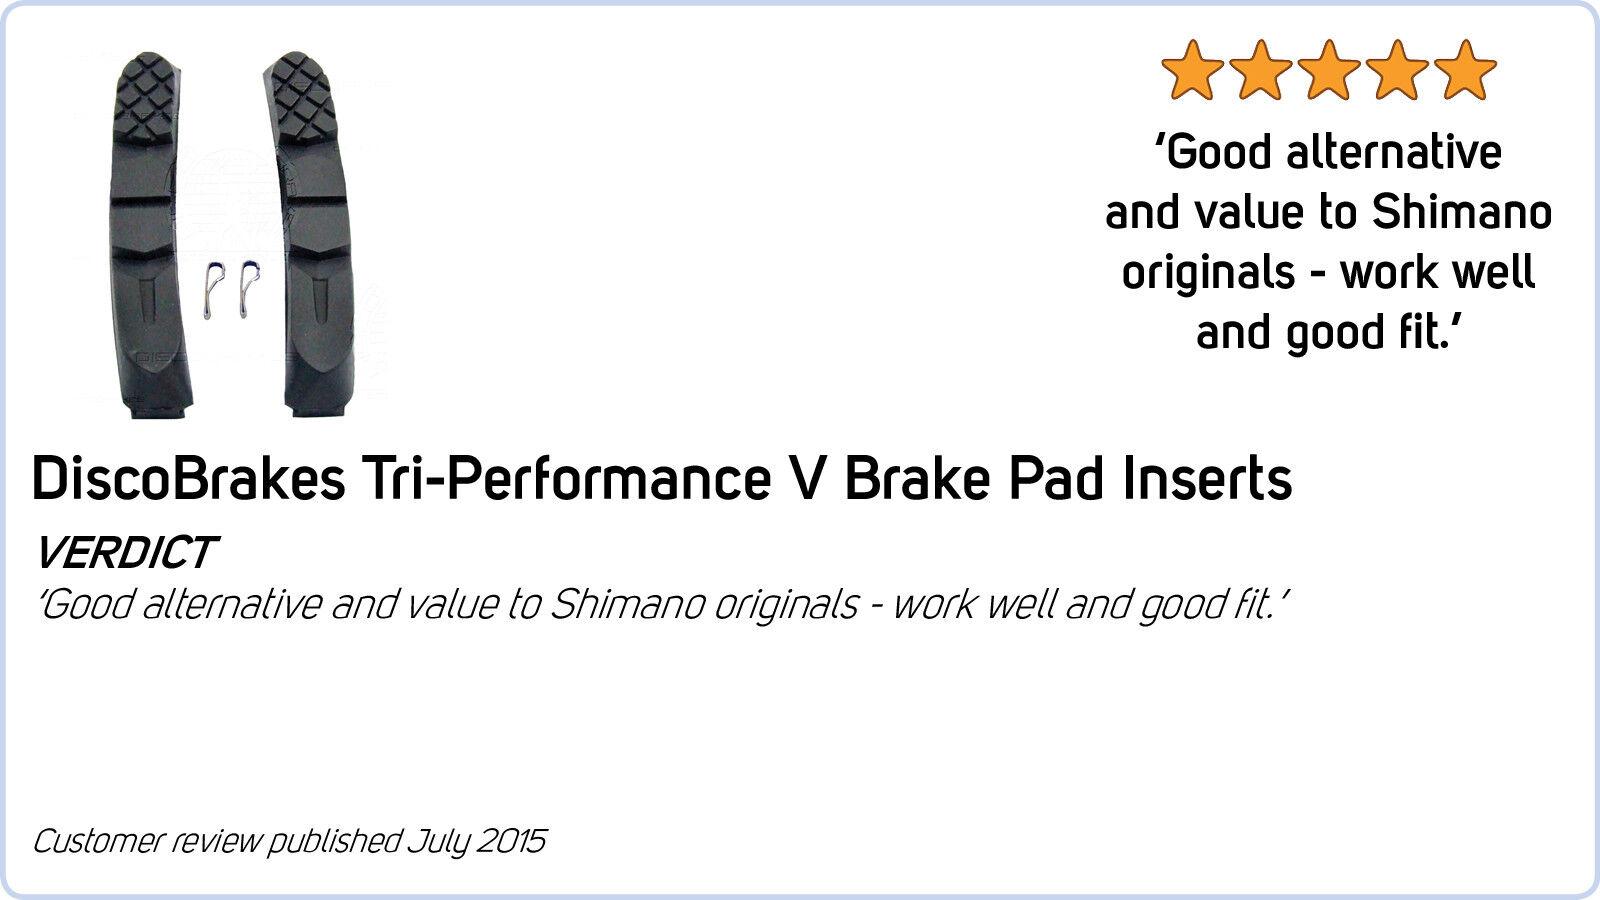 4 paires de DiscoBrakes V plaquettes de de de frein pour Shimano Sram Avid tektro DiaCompe 60mm 1ac391